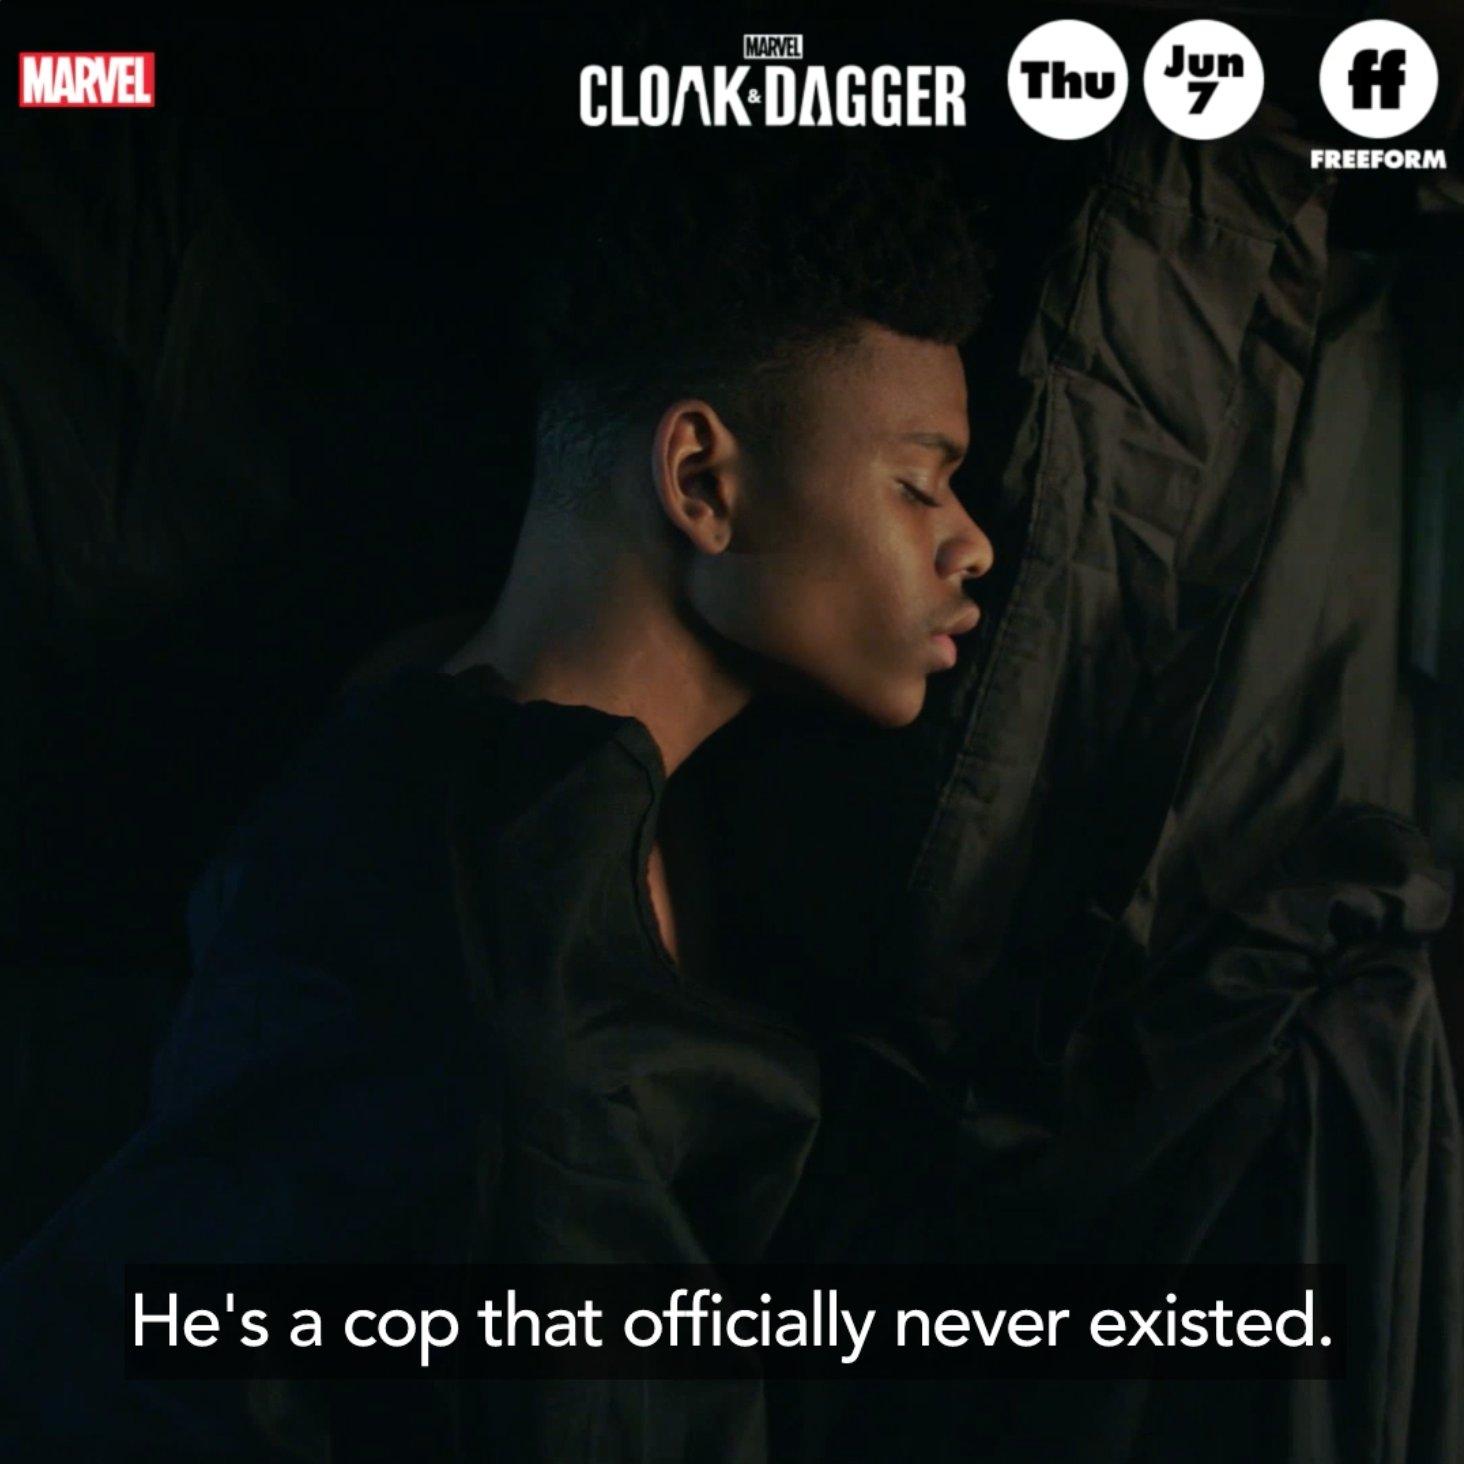 Taking back what is theirs.  Marvel's #CloakAndDagger premieres Thursday, June 7 on @FreeformTV. https://t.co/2kwSeMej78